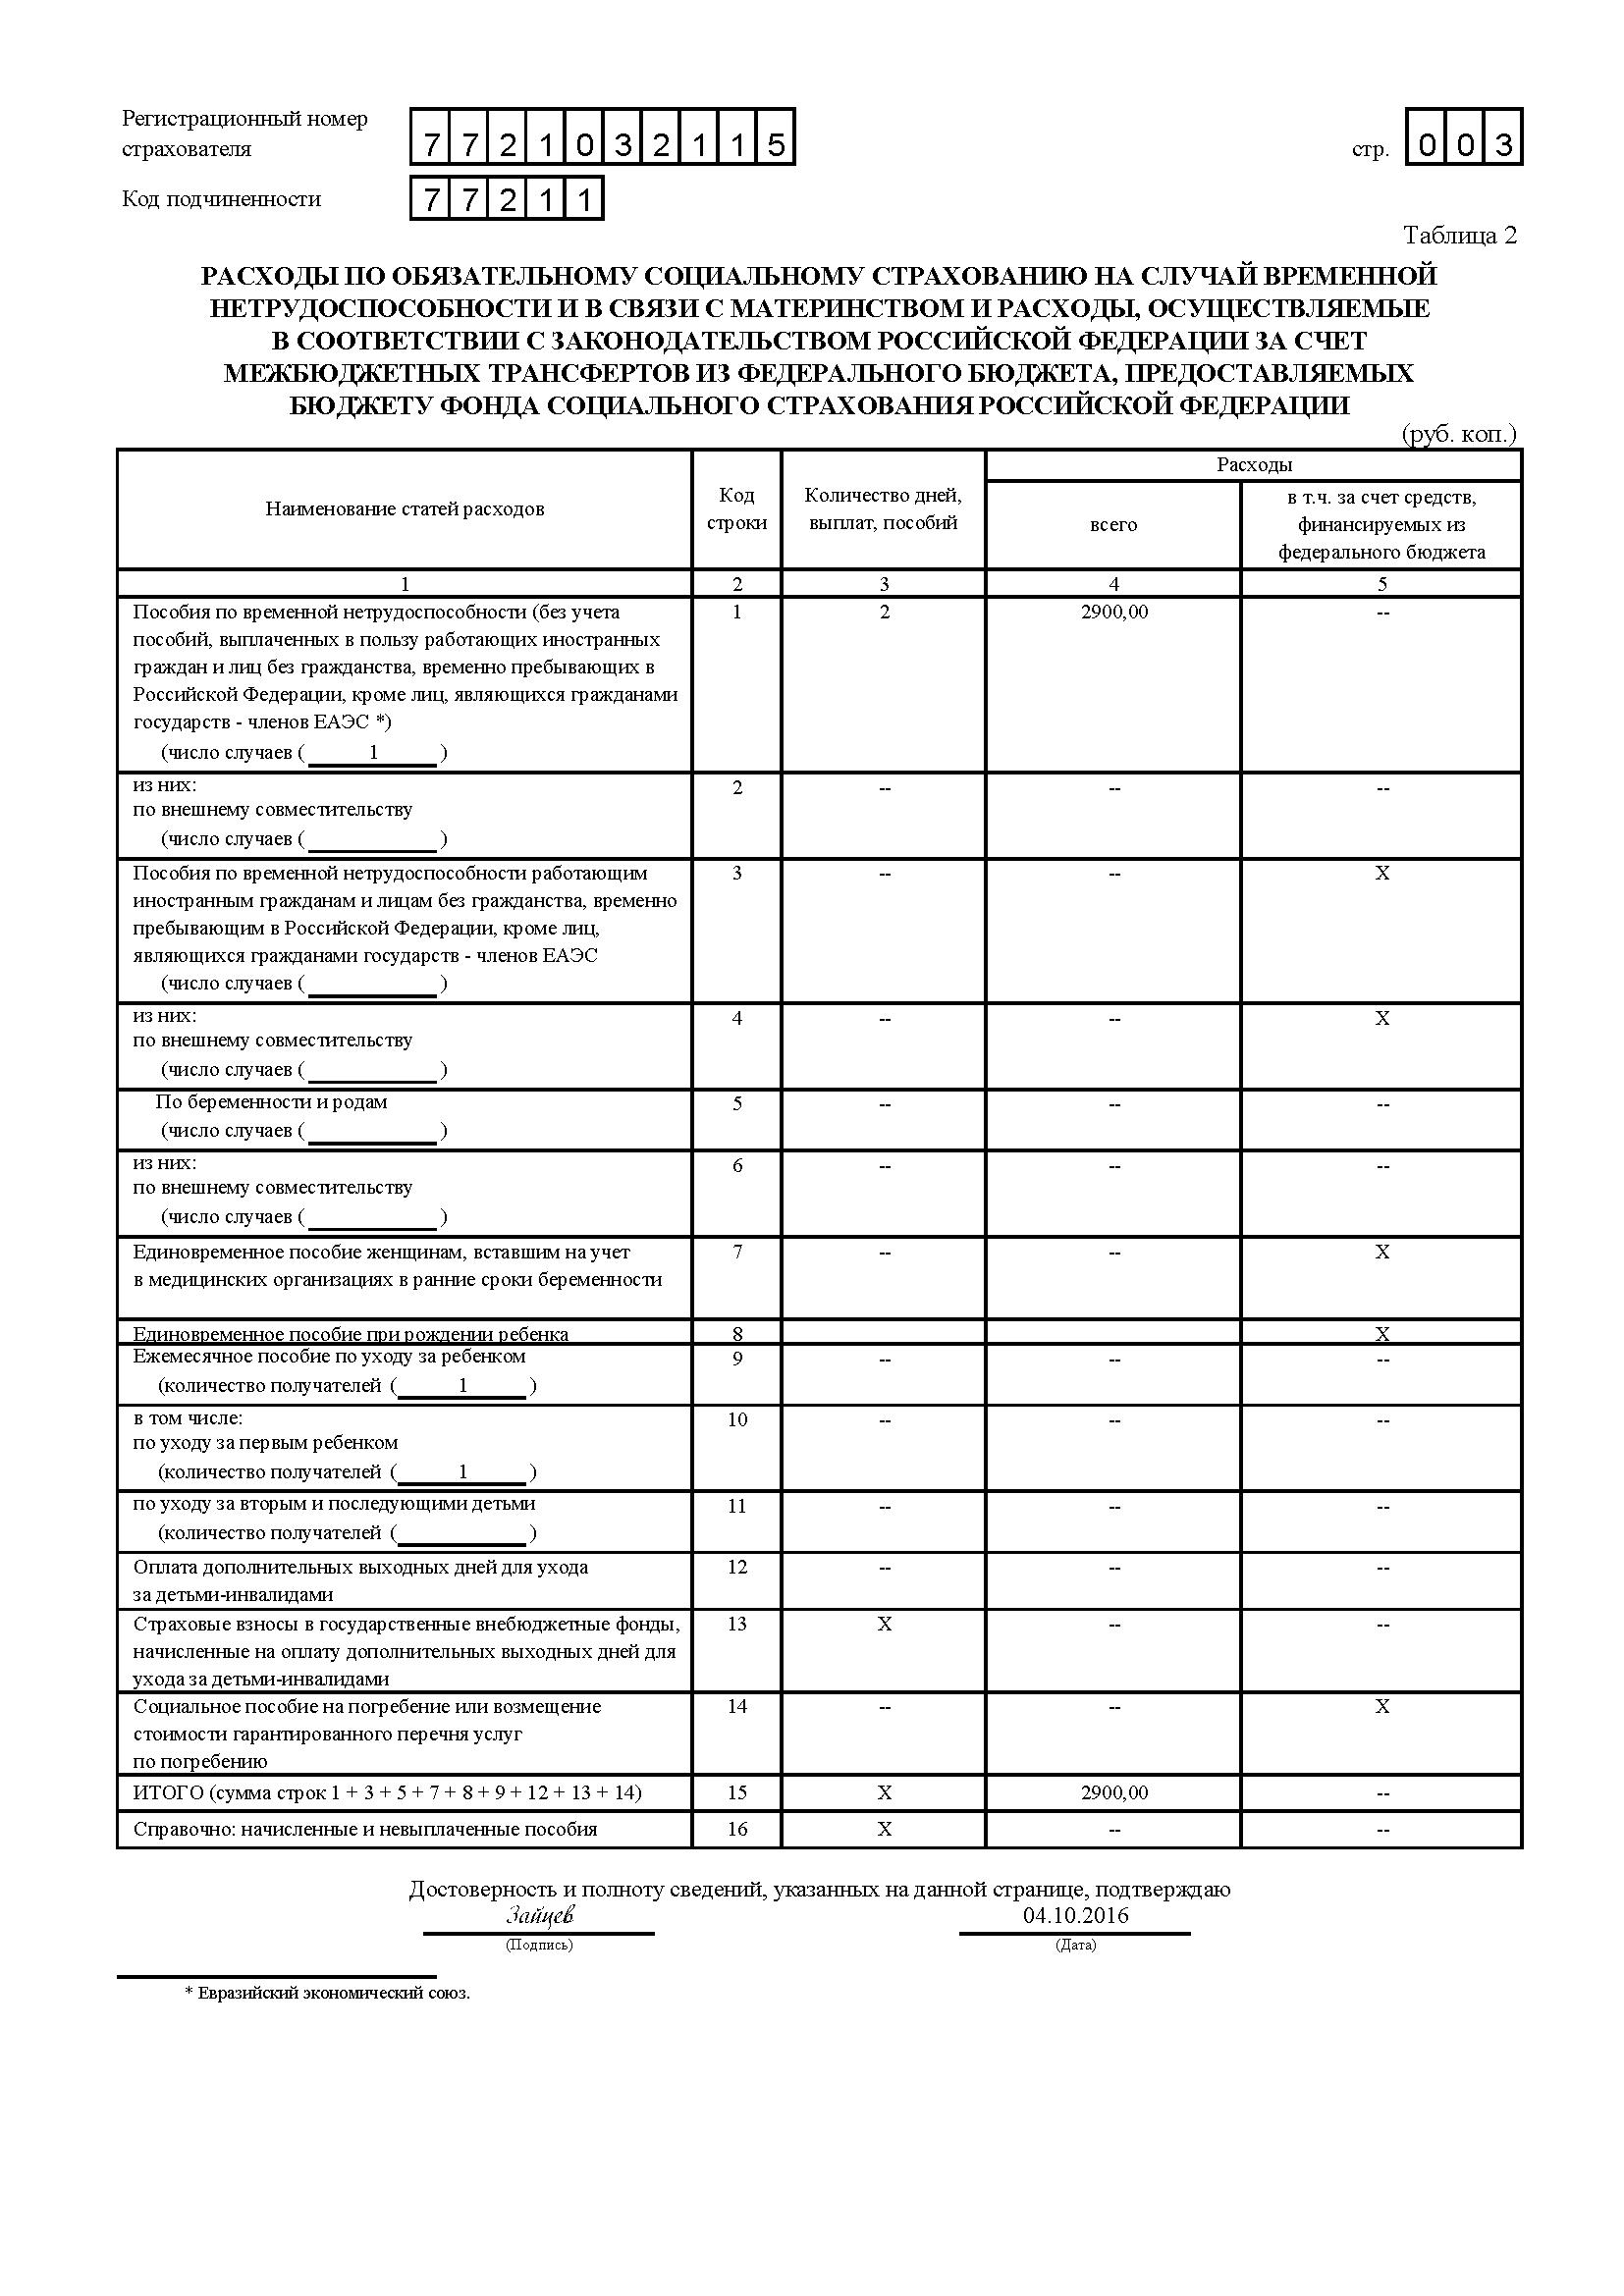 Образец заполнения 4-ФСС за 3 квартал 2016 года